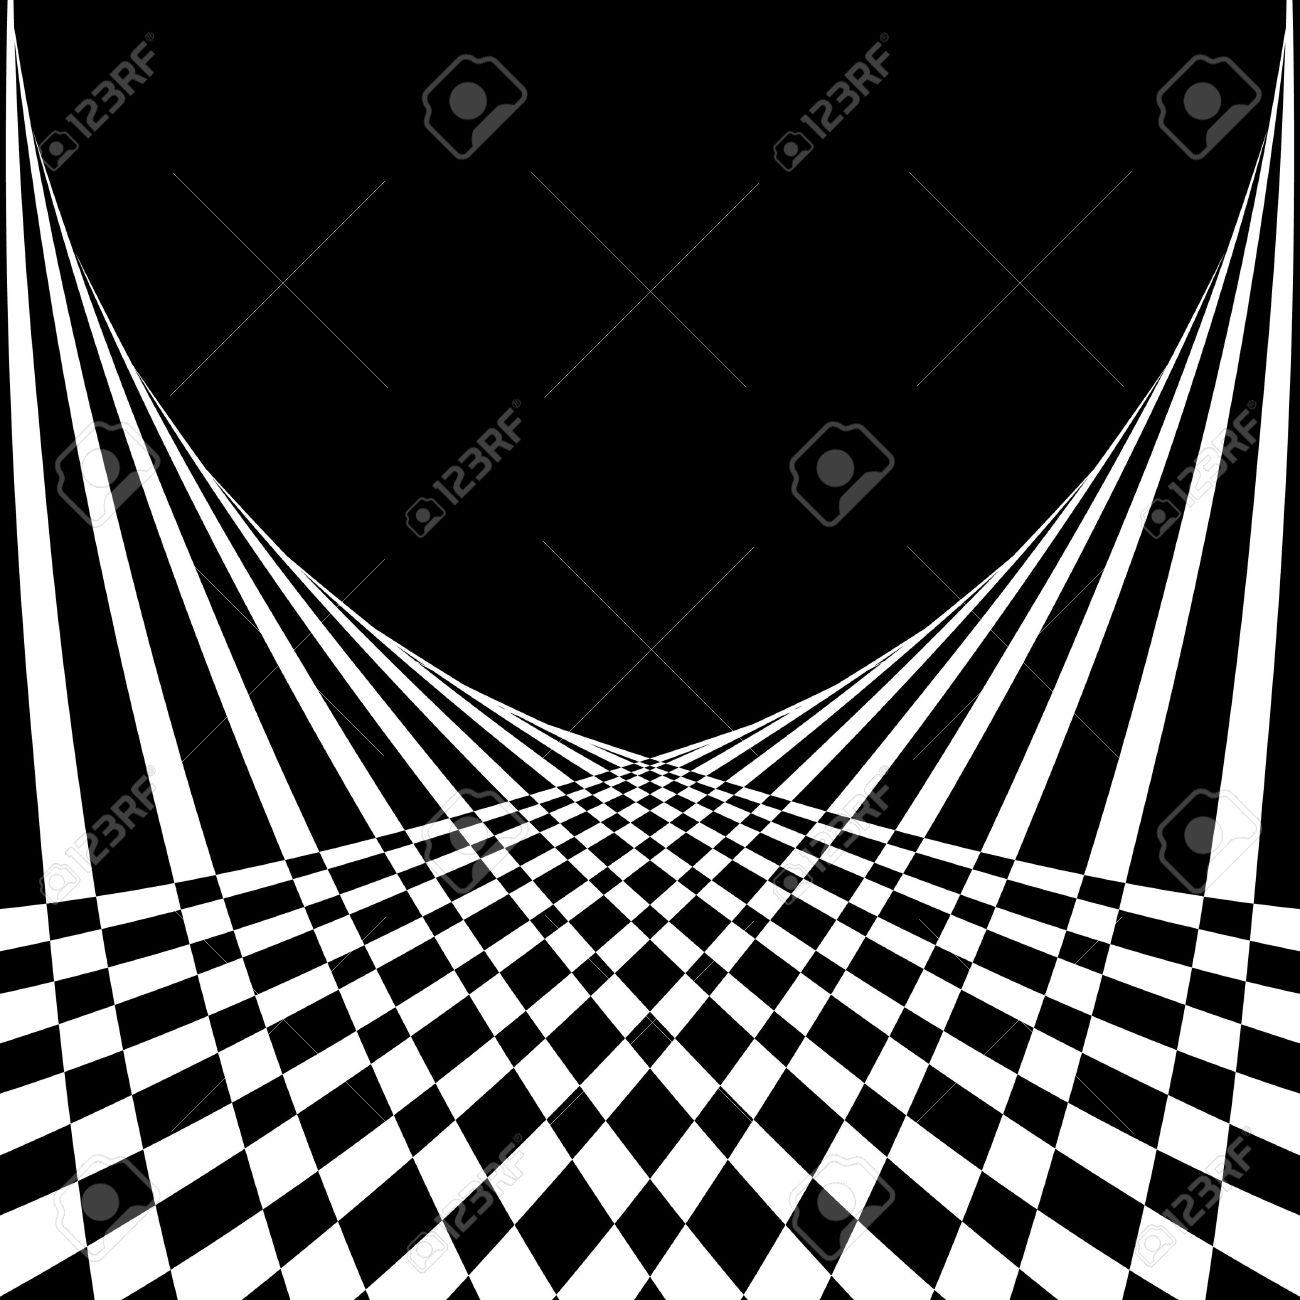 Optical Illusion clipart optica #3